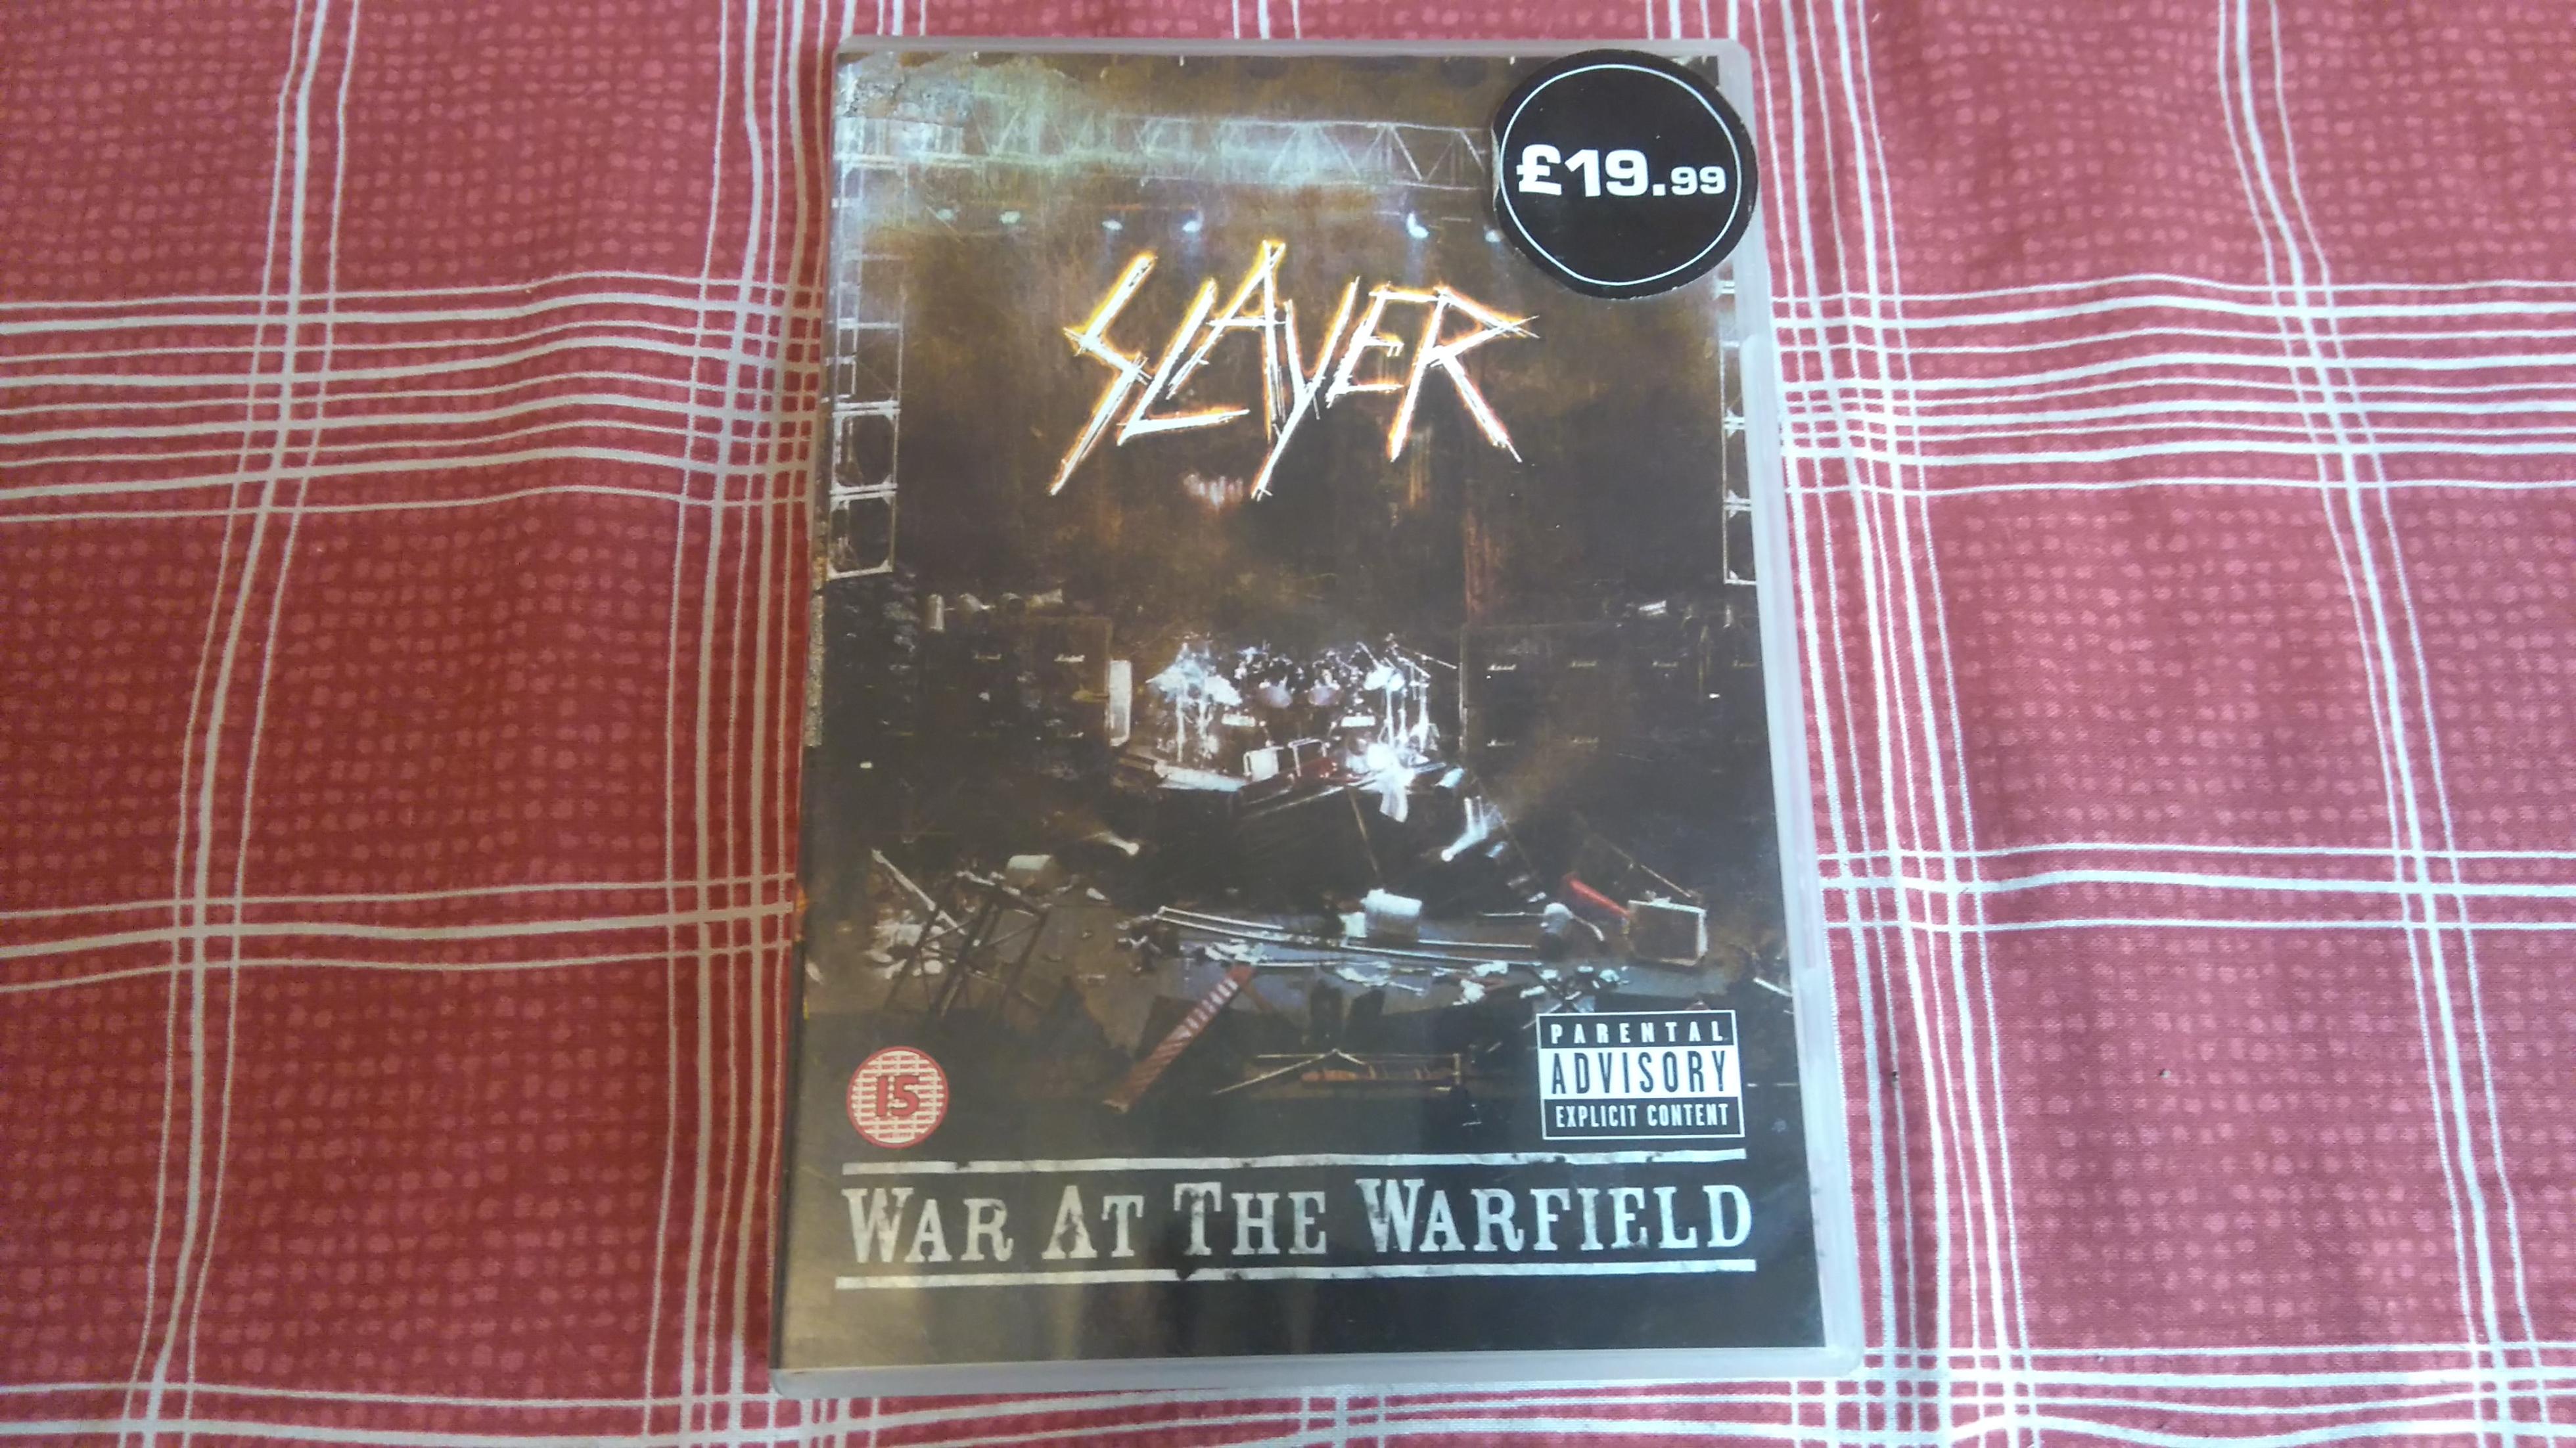 Slayer dvd.JPG